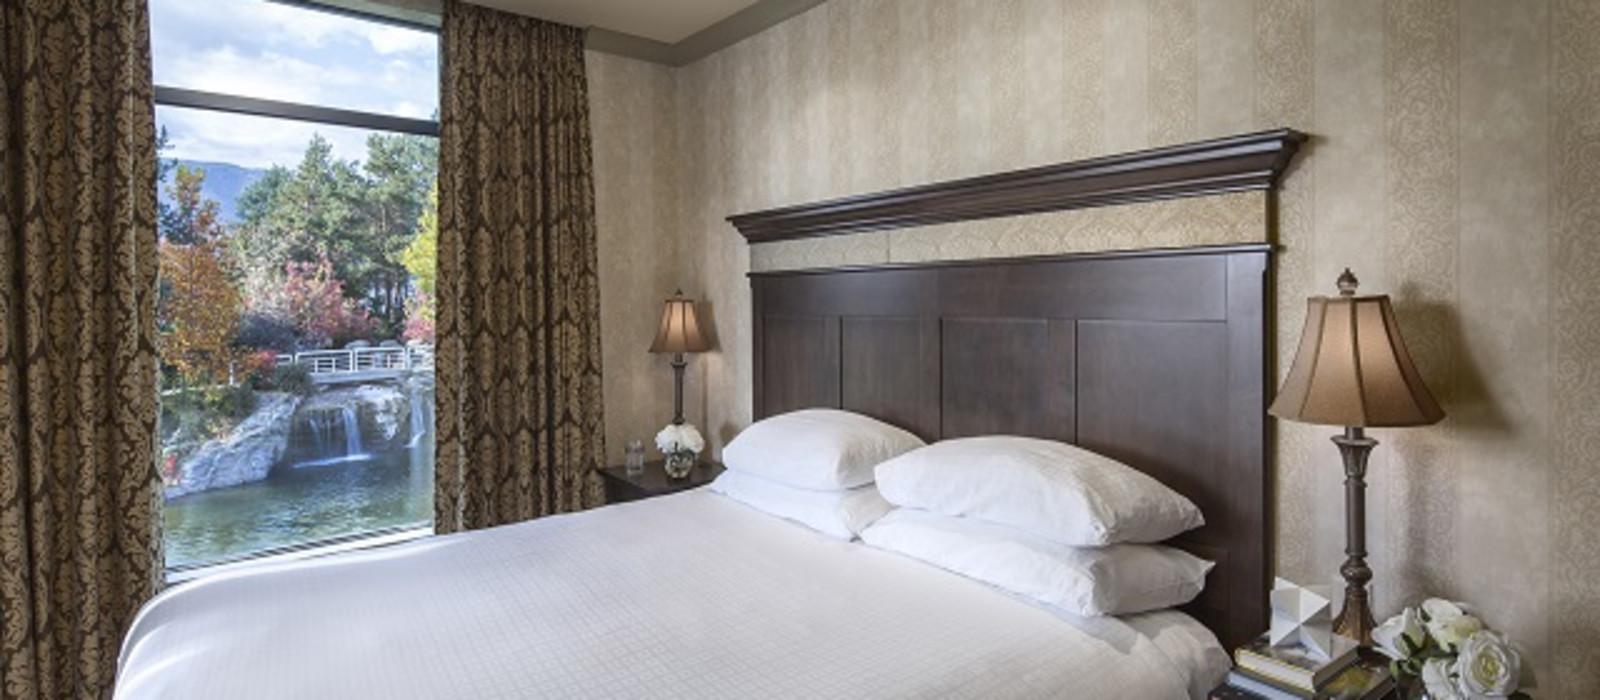 Hotel The Royal Kelowna Canada